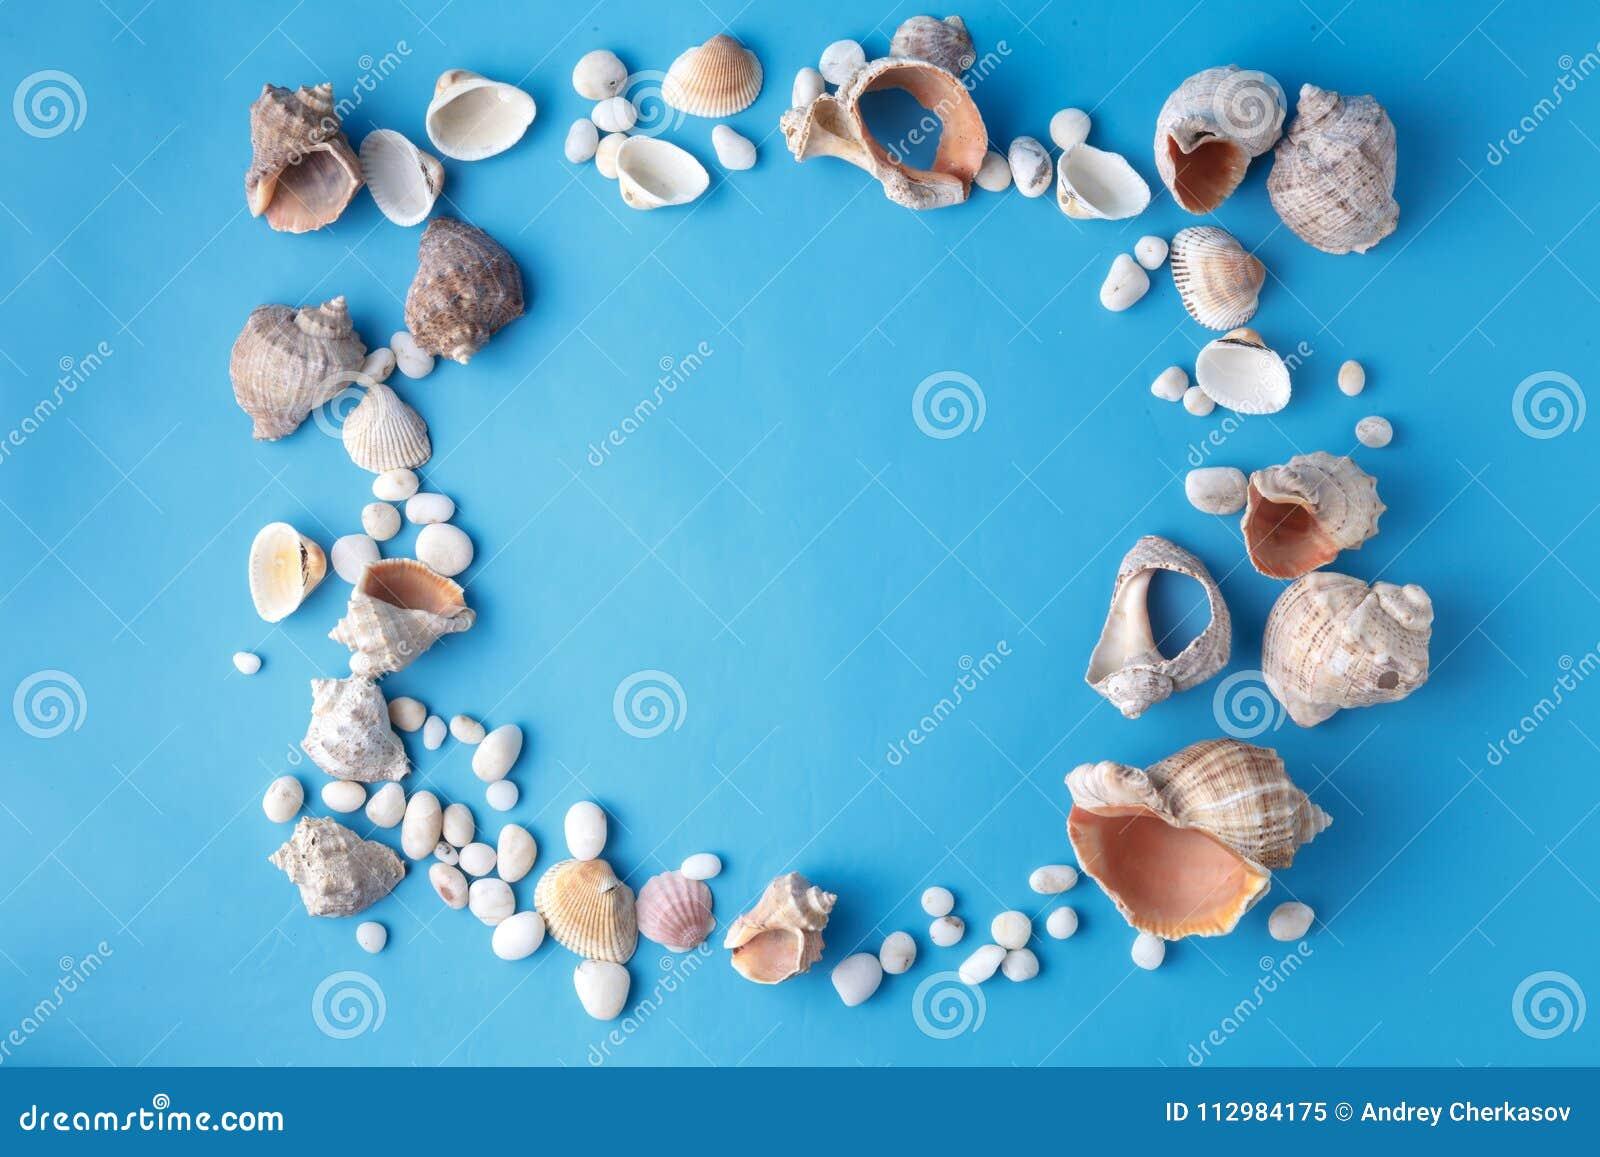 Sea shells on blue, vacaton concept on plain background